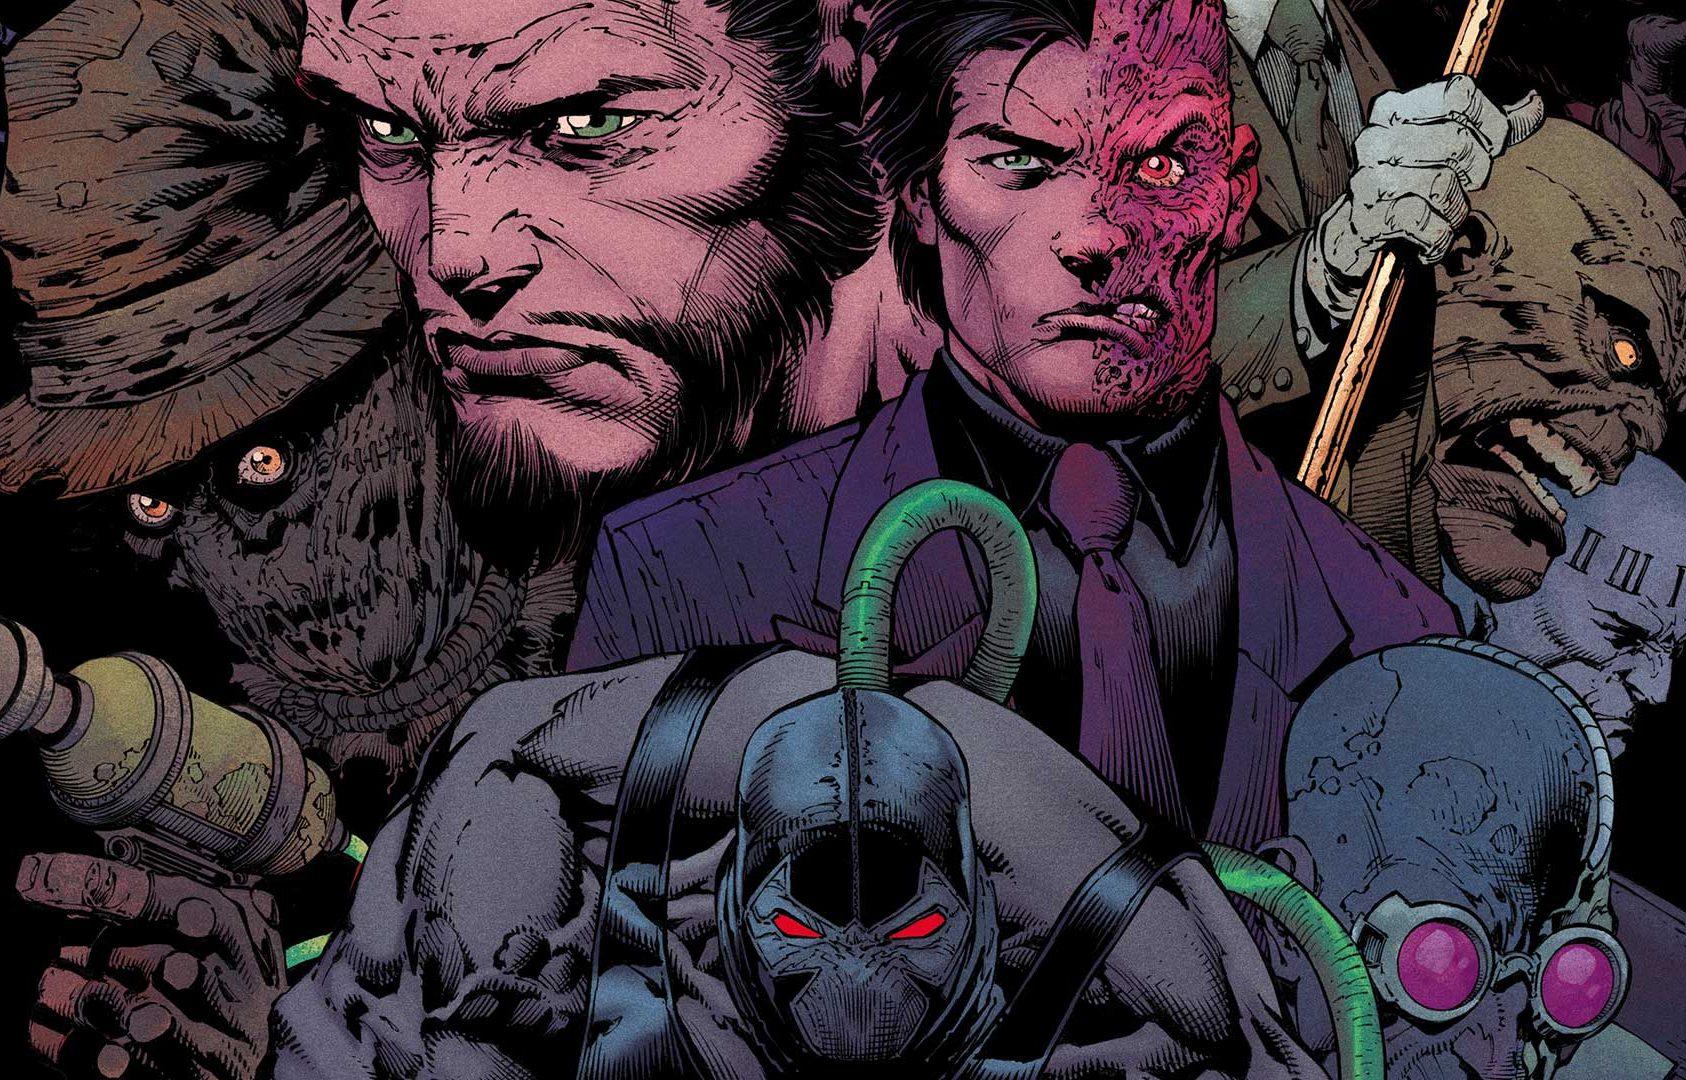 David Finch - Batman #19 cover